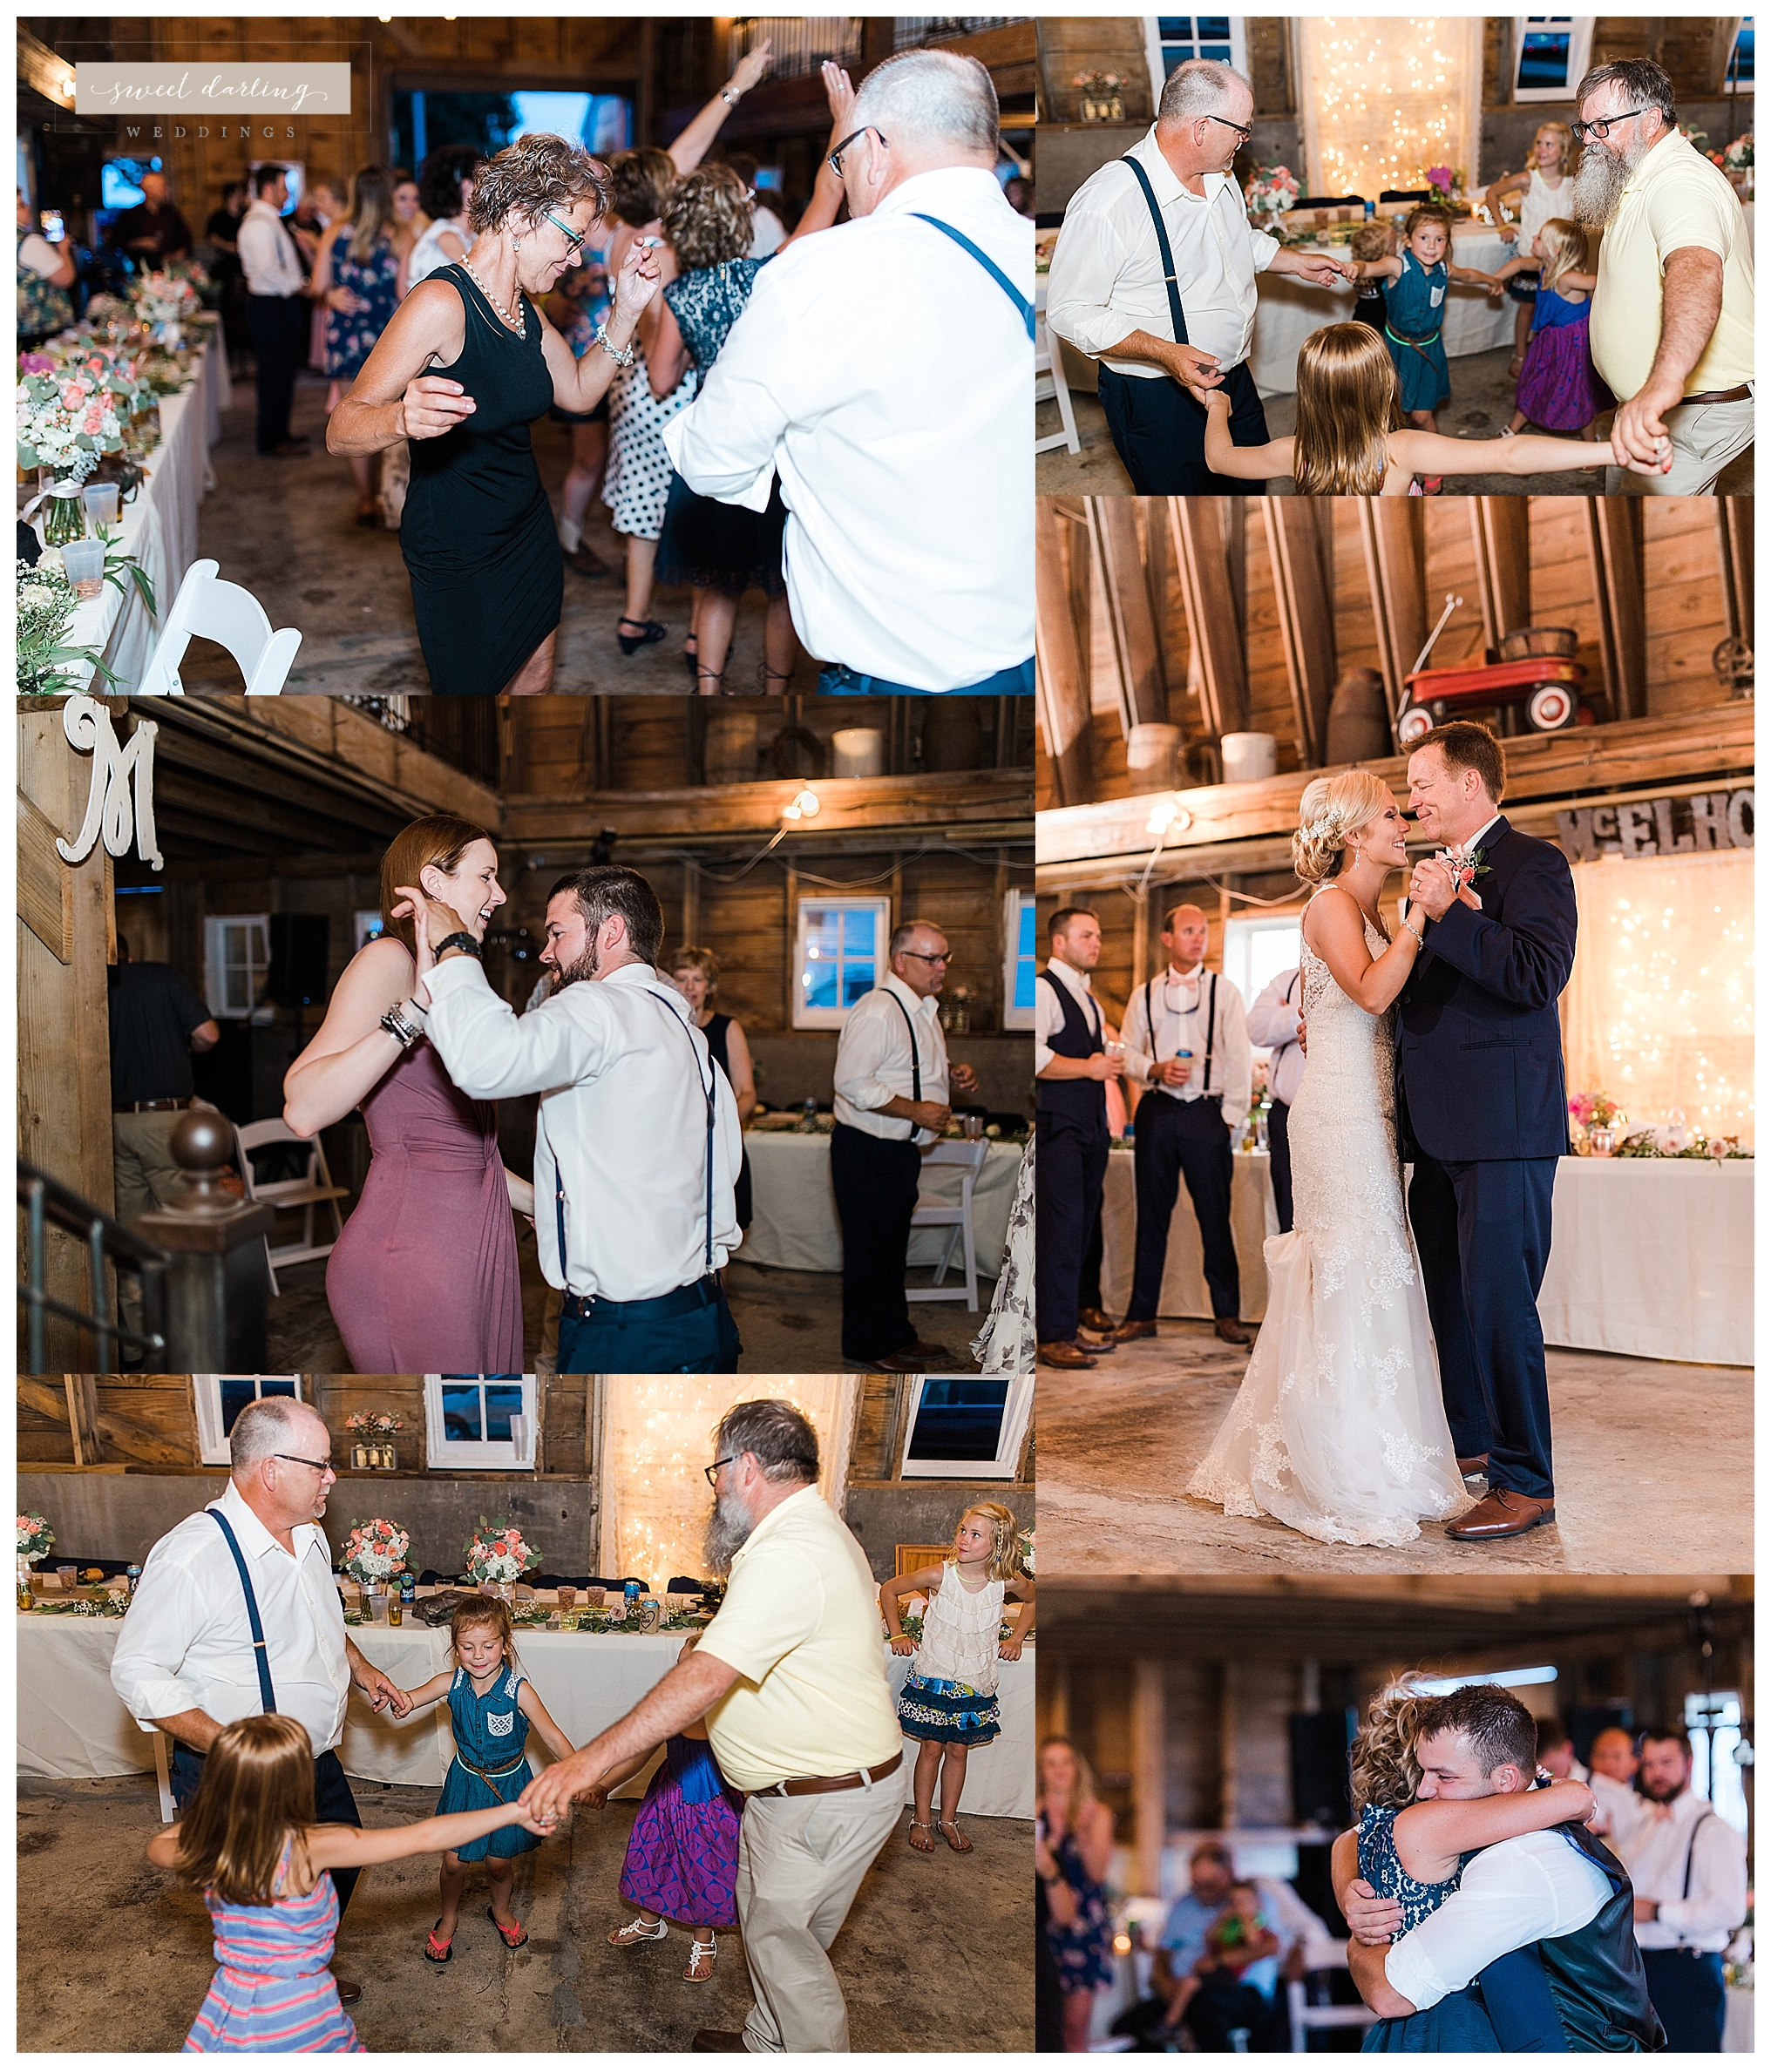 Rpaxton-illinois-engelbrecht-farm-country-wedding-photographer-sweet-darling-weddings_1263.jpg